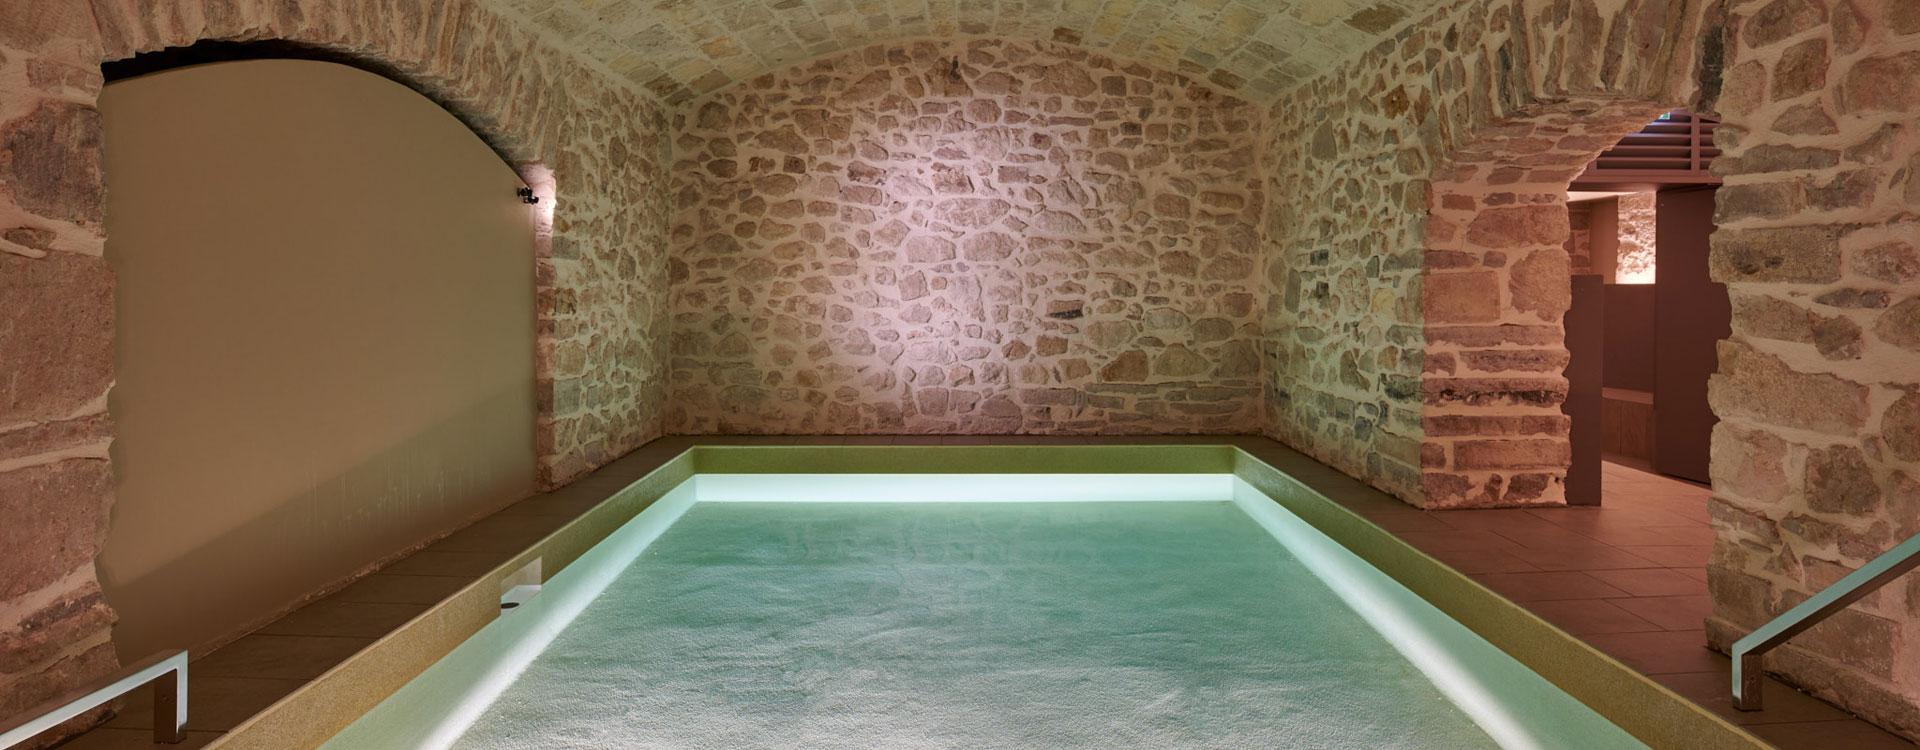 splendid spa dax - flotarium